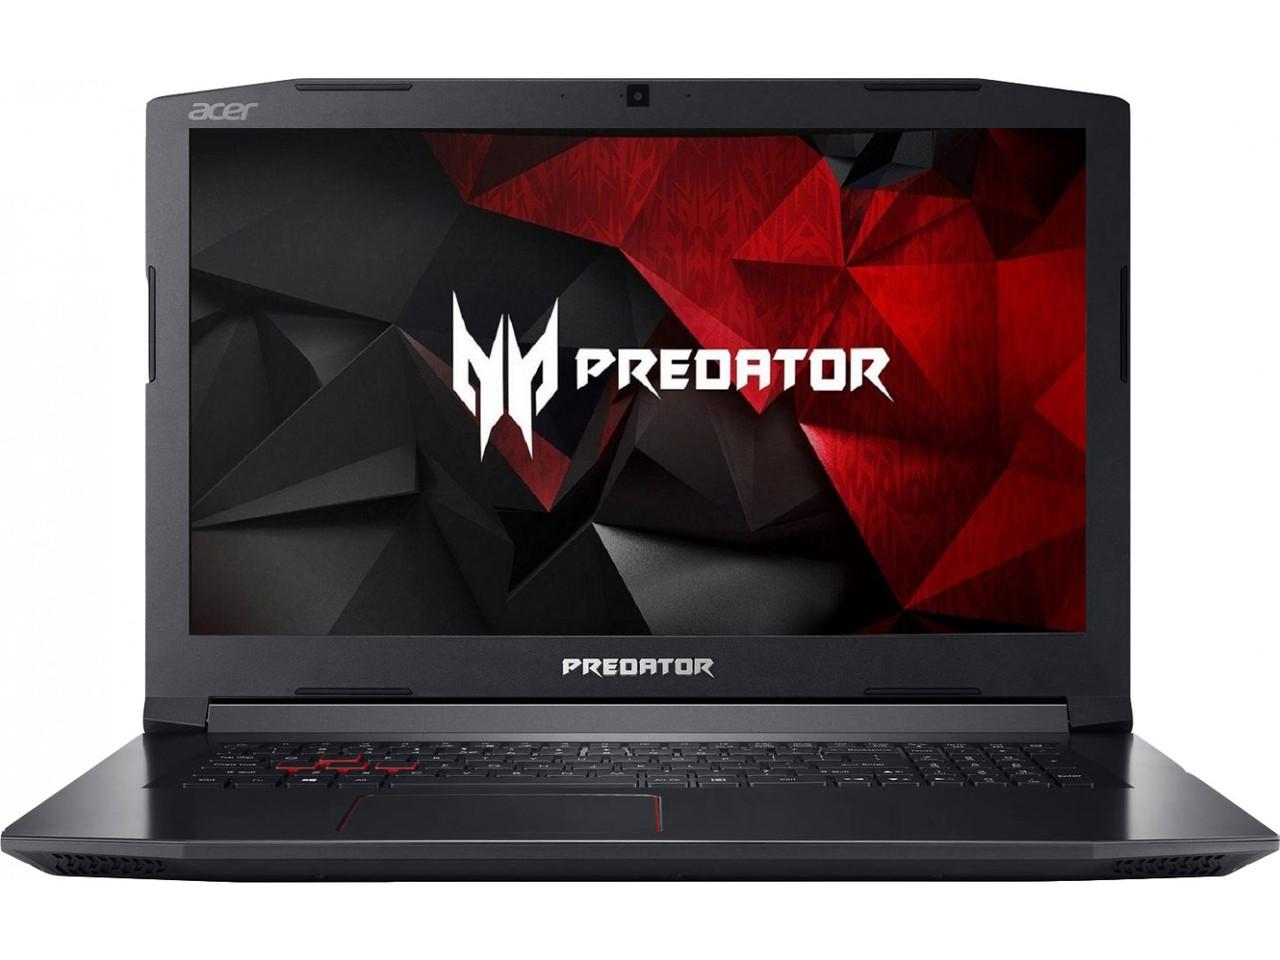 Ноутбук Acer Predator Helios 300 PH317-53-71UM (NH.Q5QEU.026) Abyssal Black